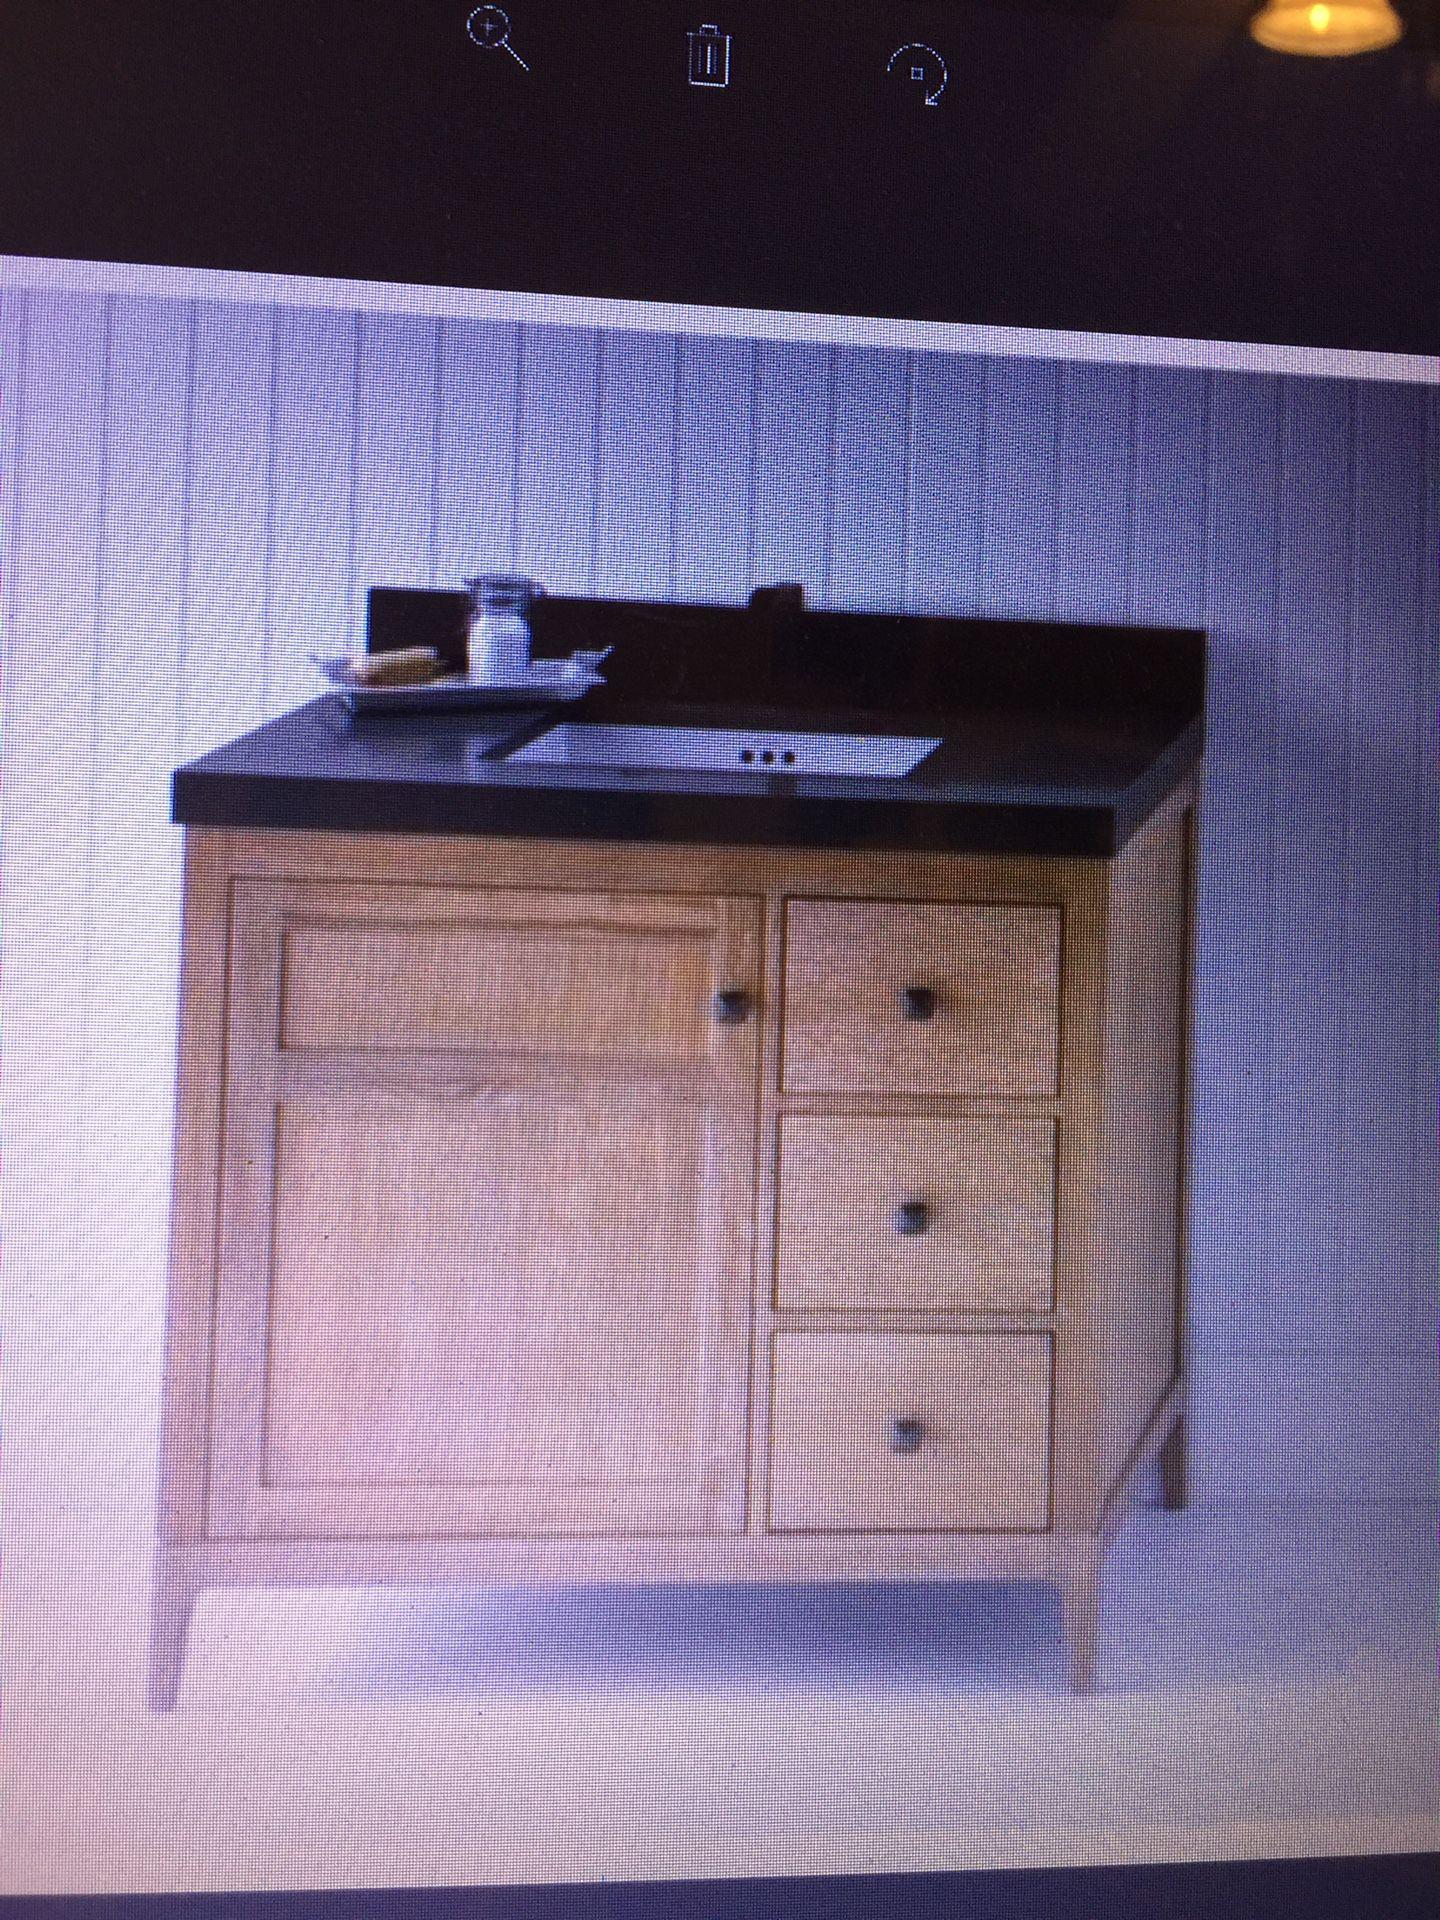 Grate wood vanity furniture new in case